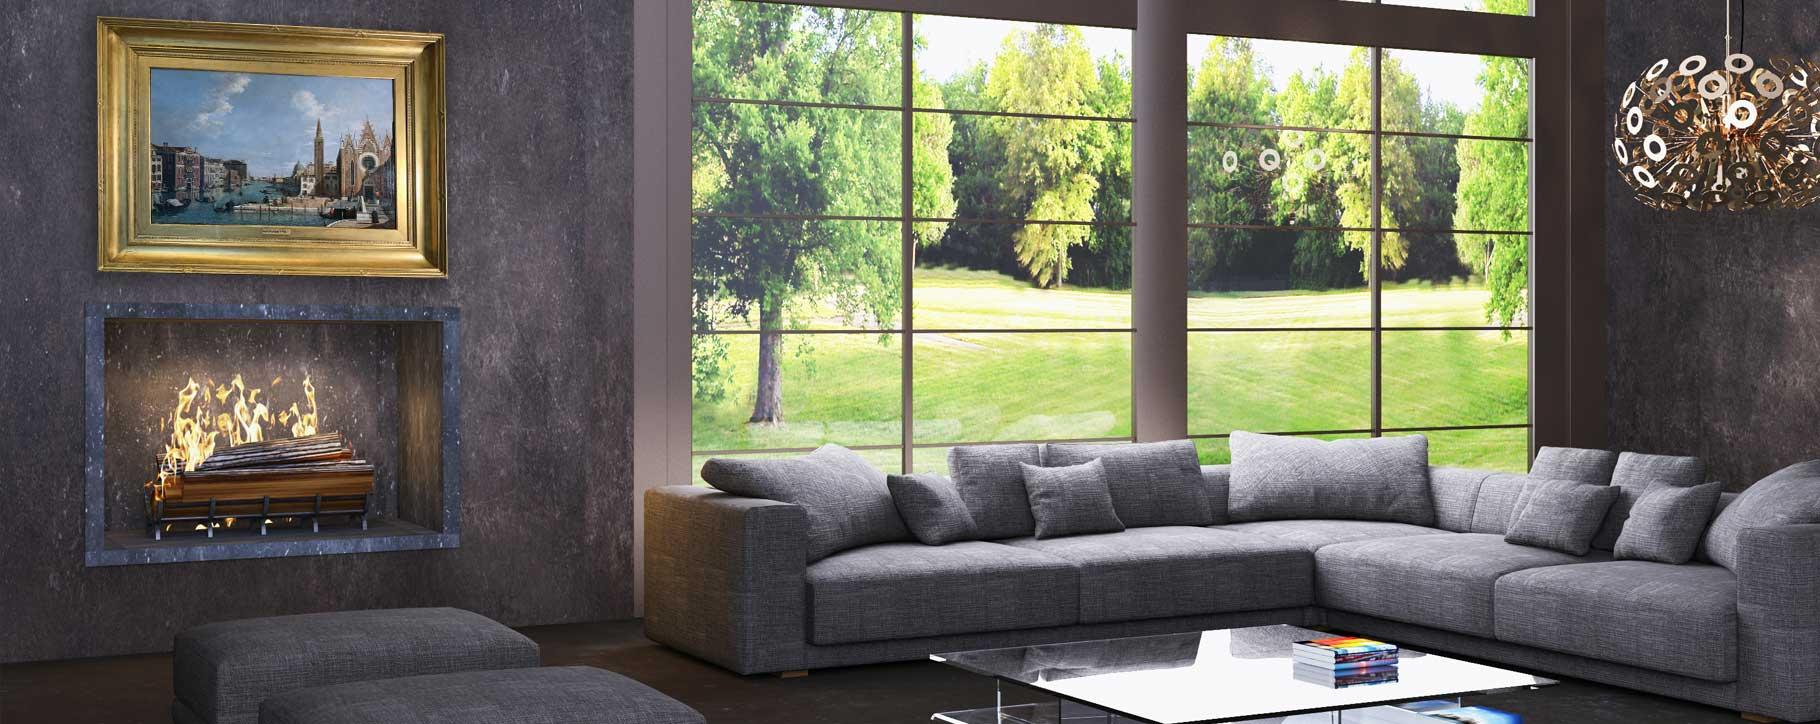 grey living room art over fire